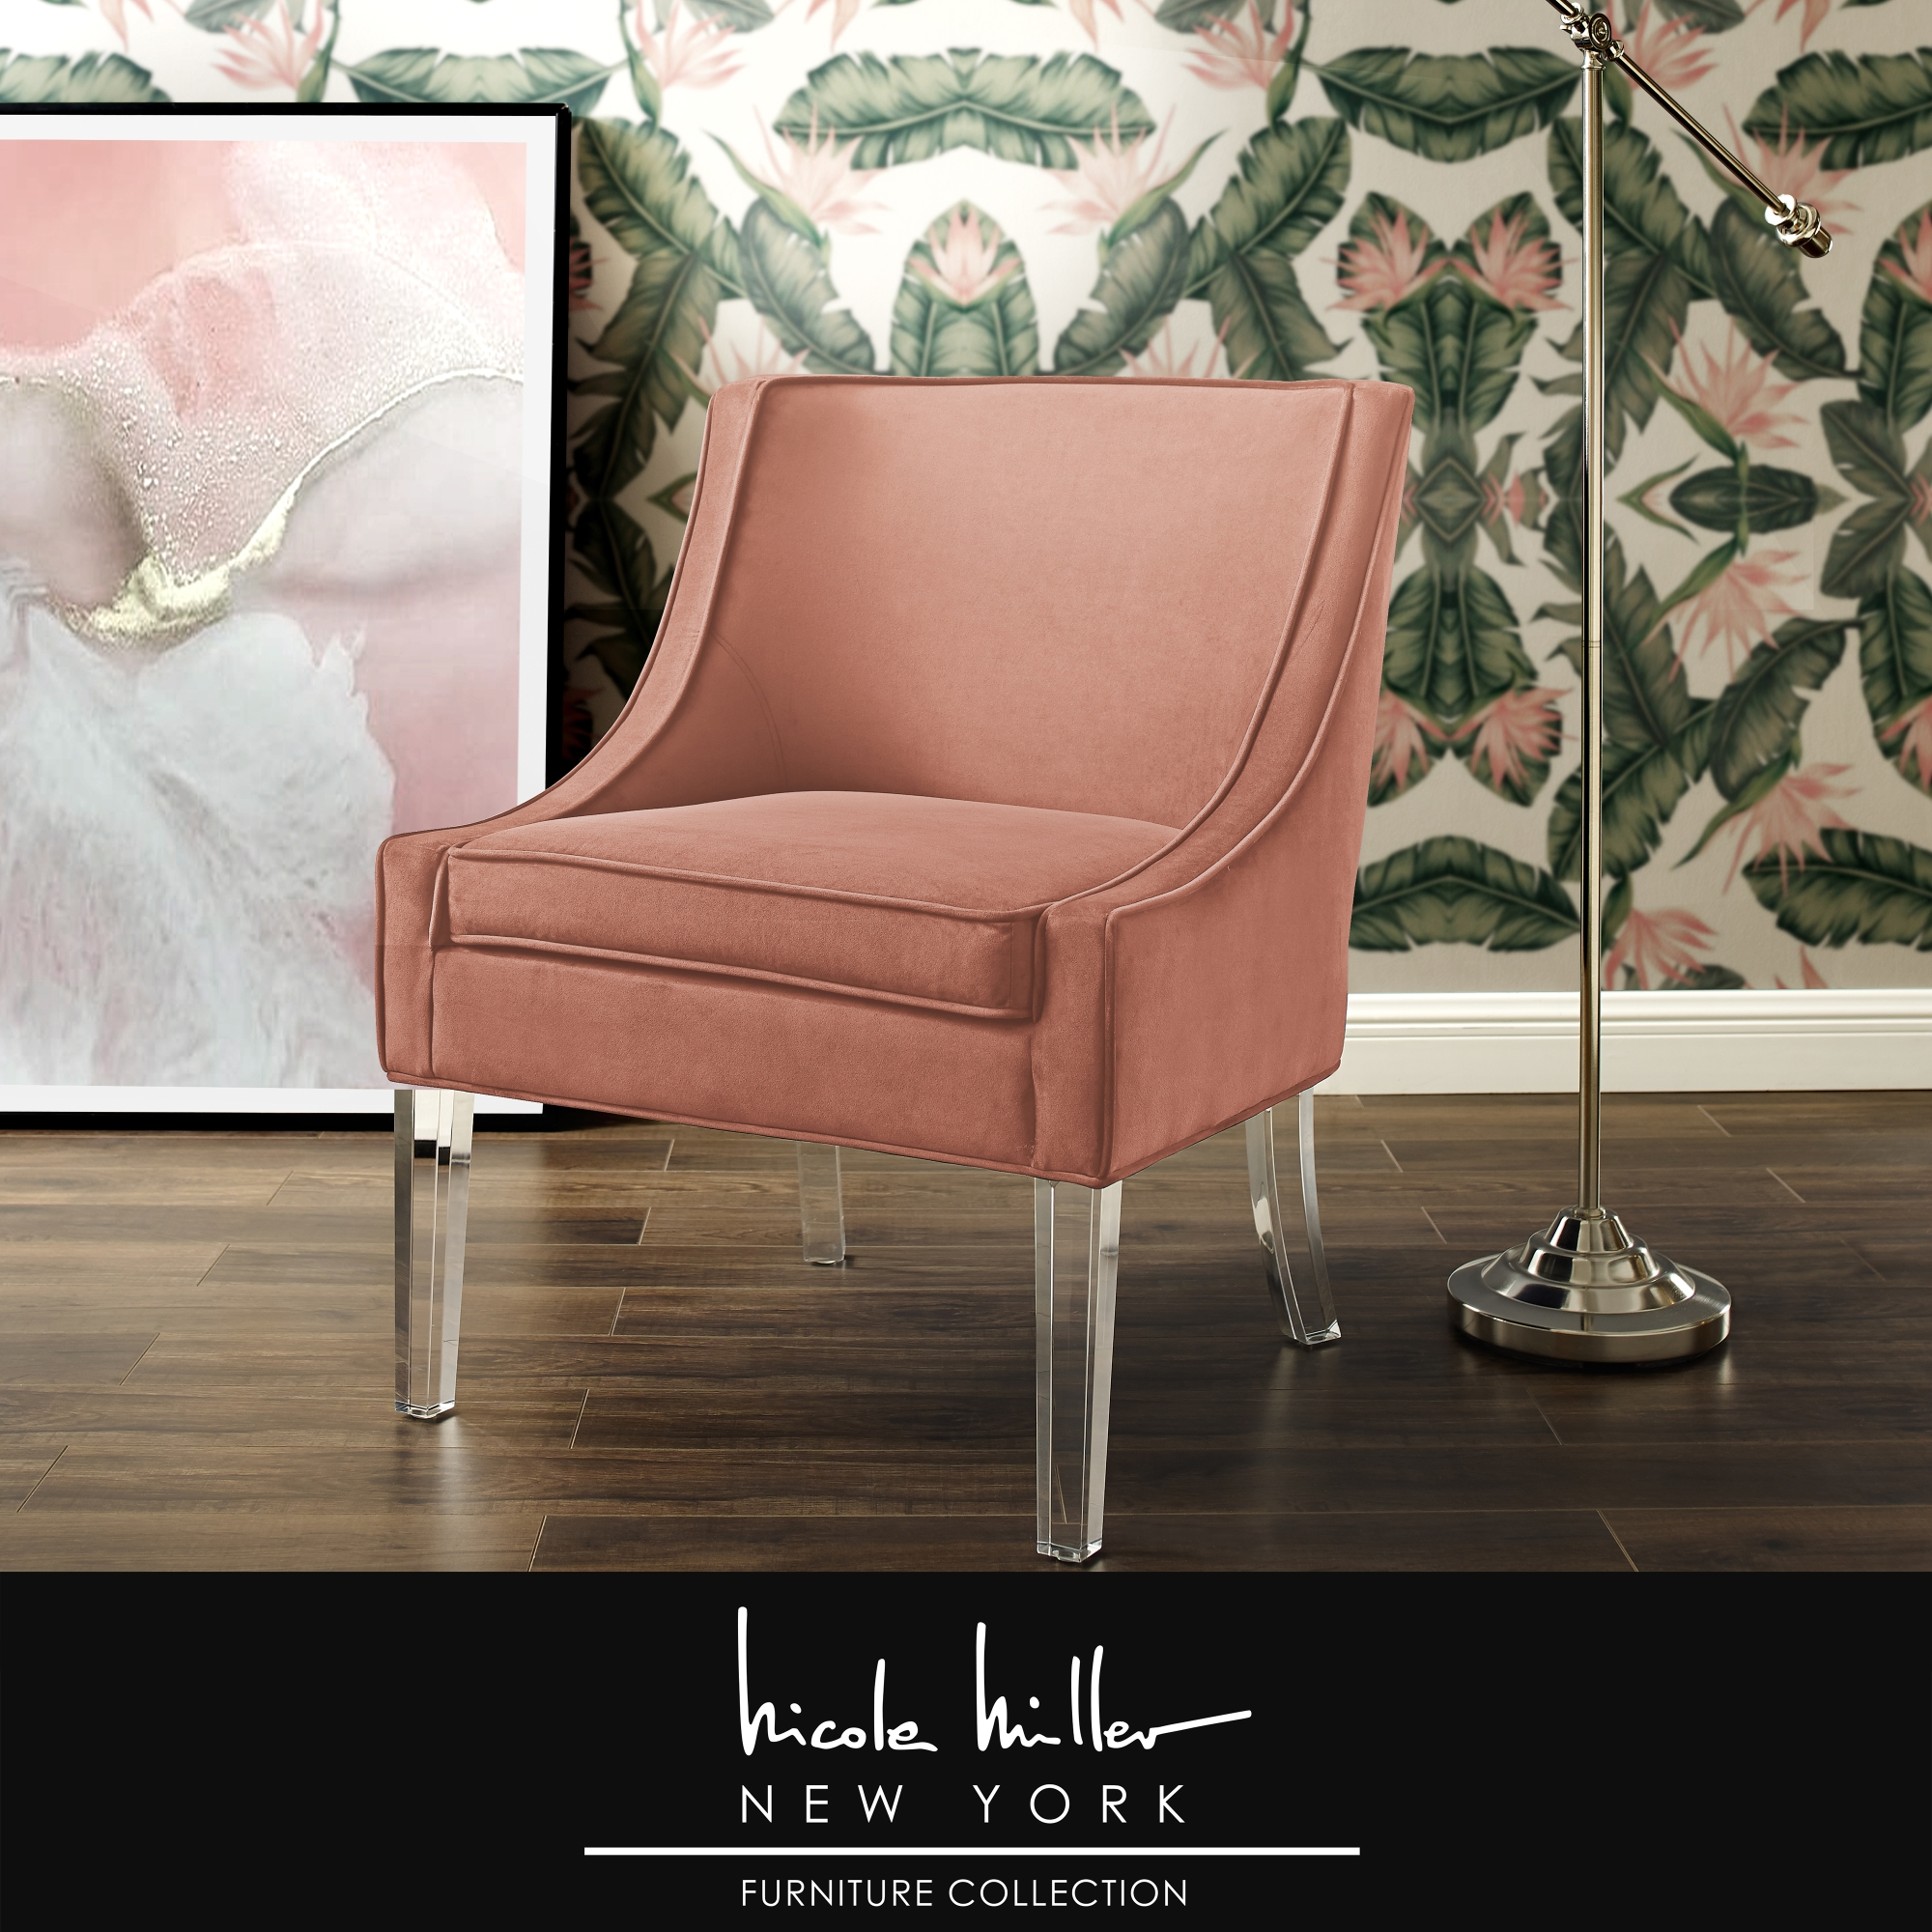 Nicole Miller Blush Velvet Accent Chair Upholstered Armless Clear Acrylic Leg